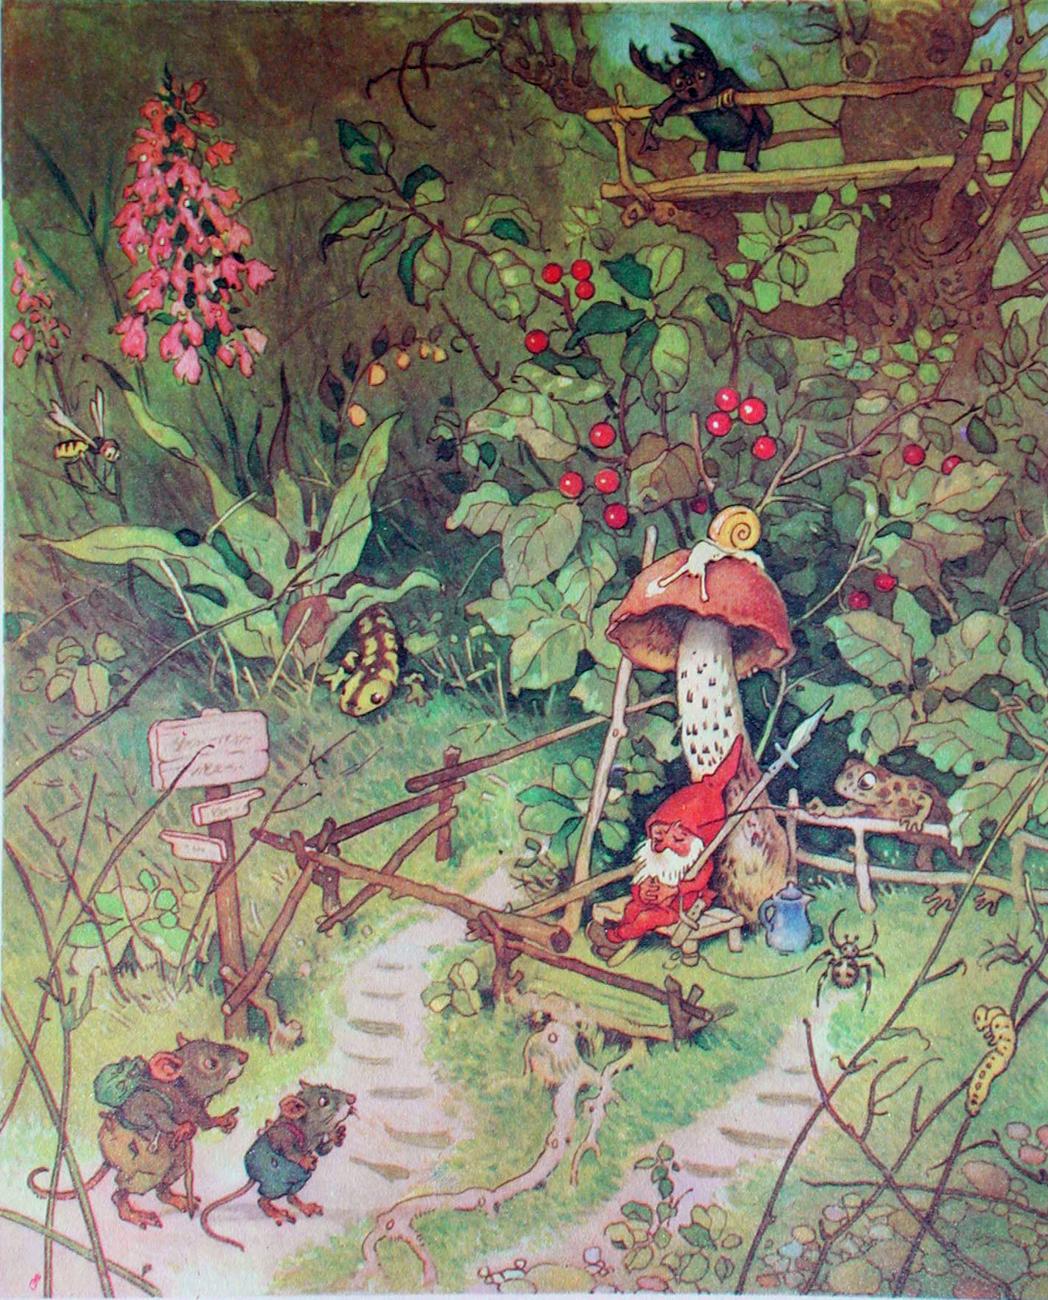 1000 images about illustraties fritz baumgarten on pinterest for Baum garten